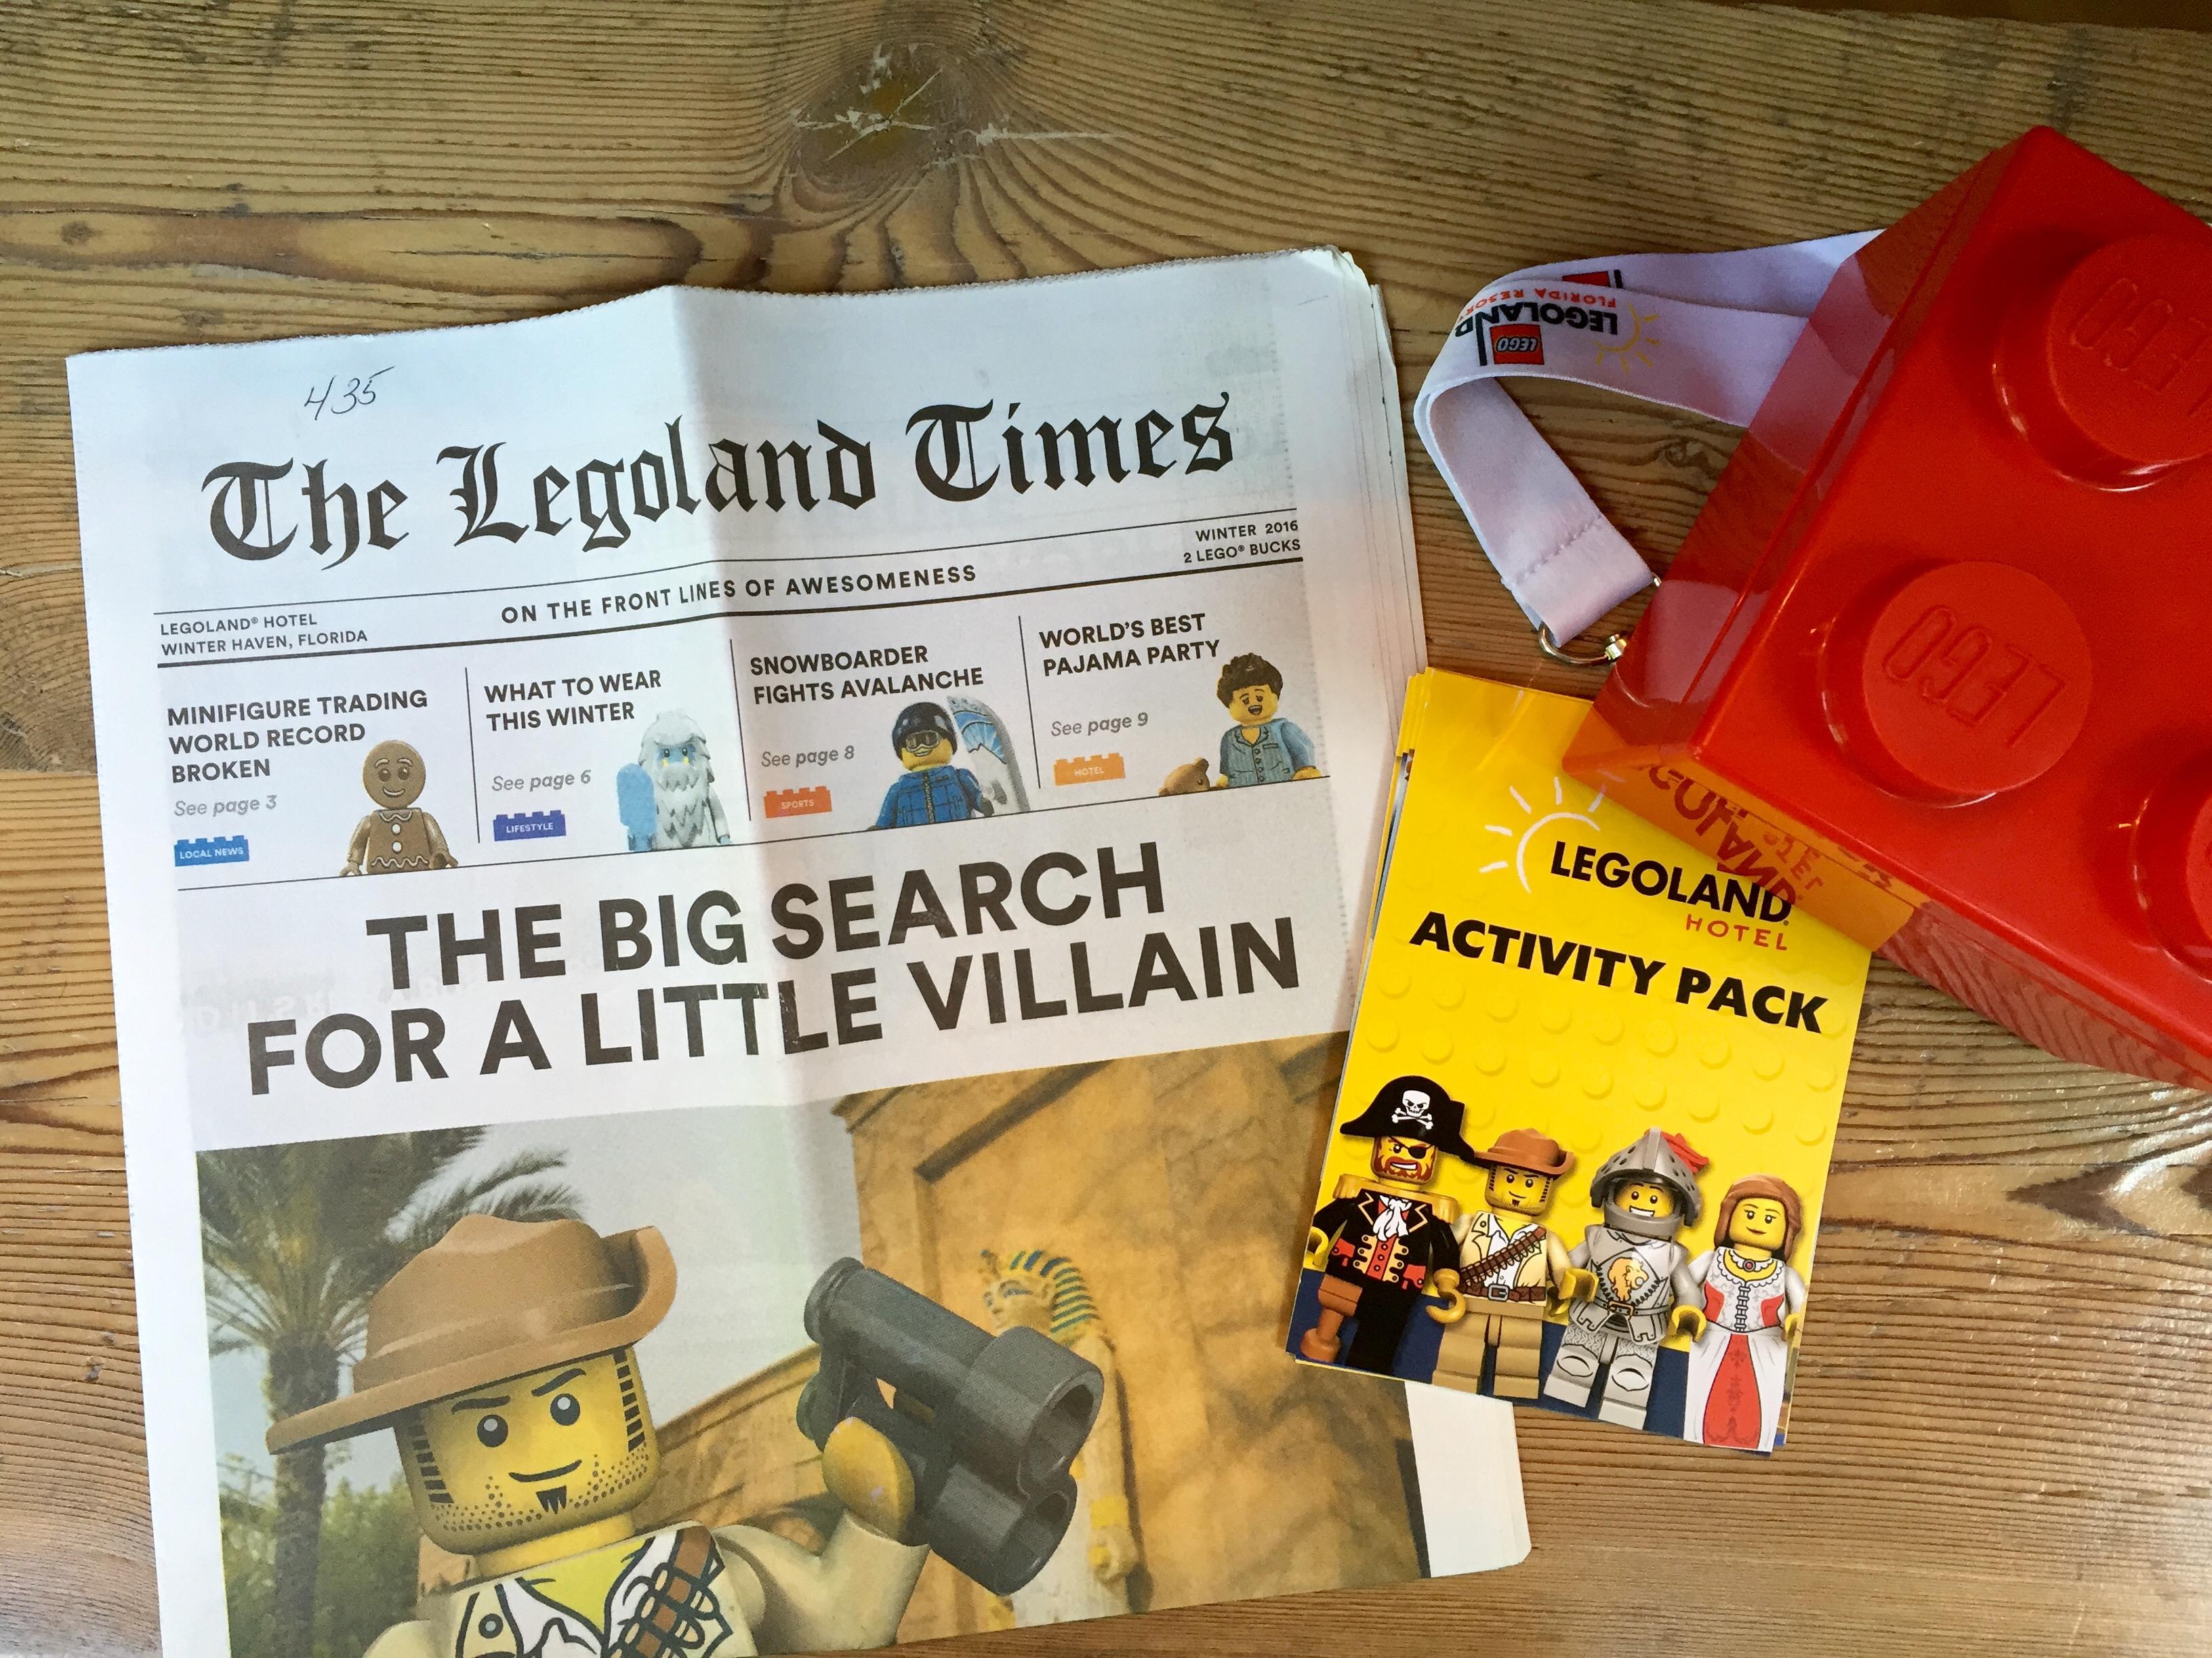 The Legoland Times